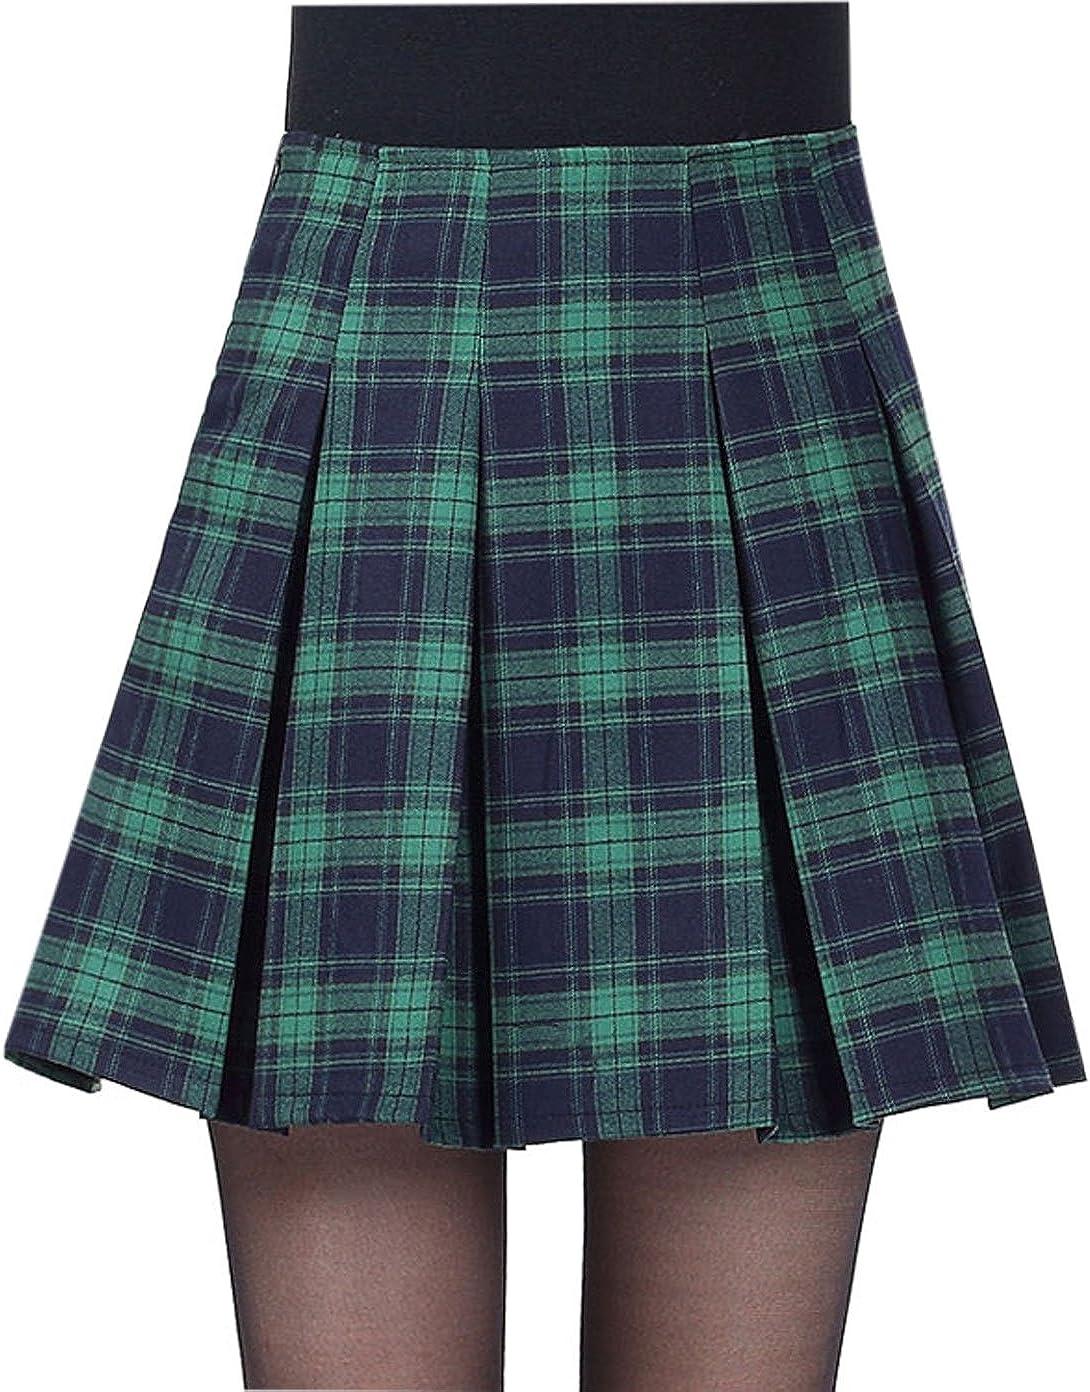 Yeokou Women's Casual A line Pleated Check Plaid Mini Short Tartan Skirt